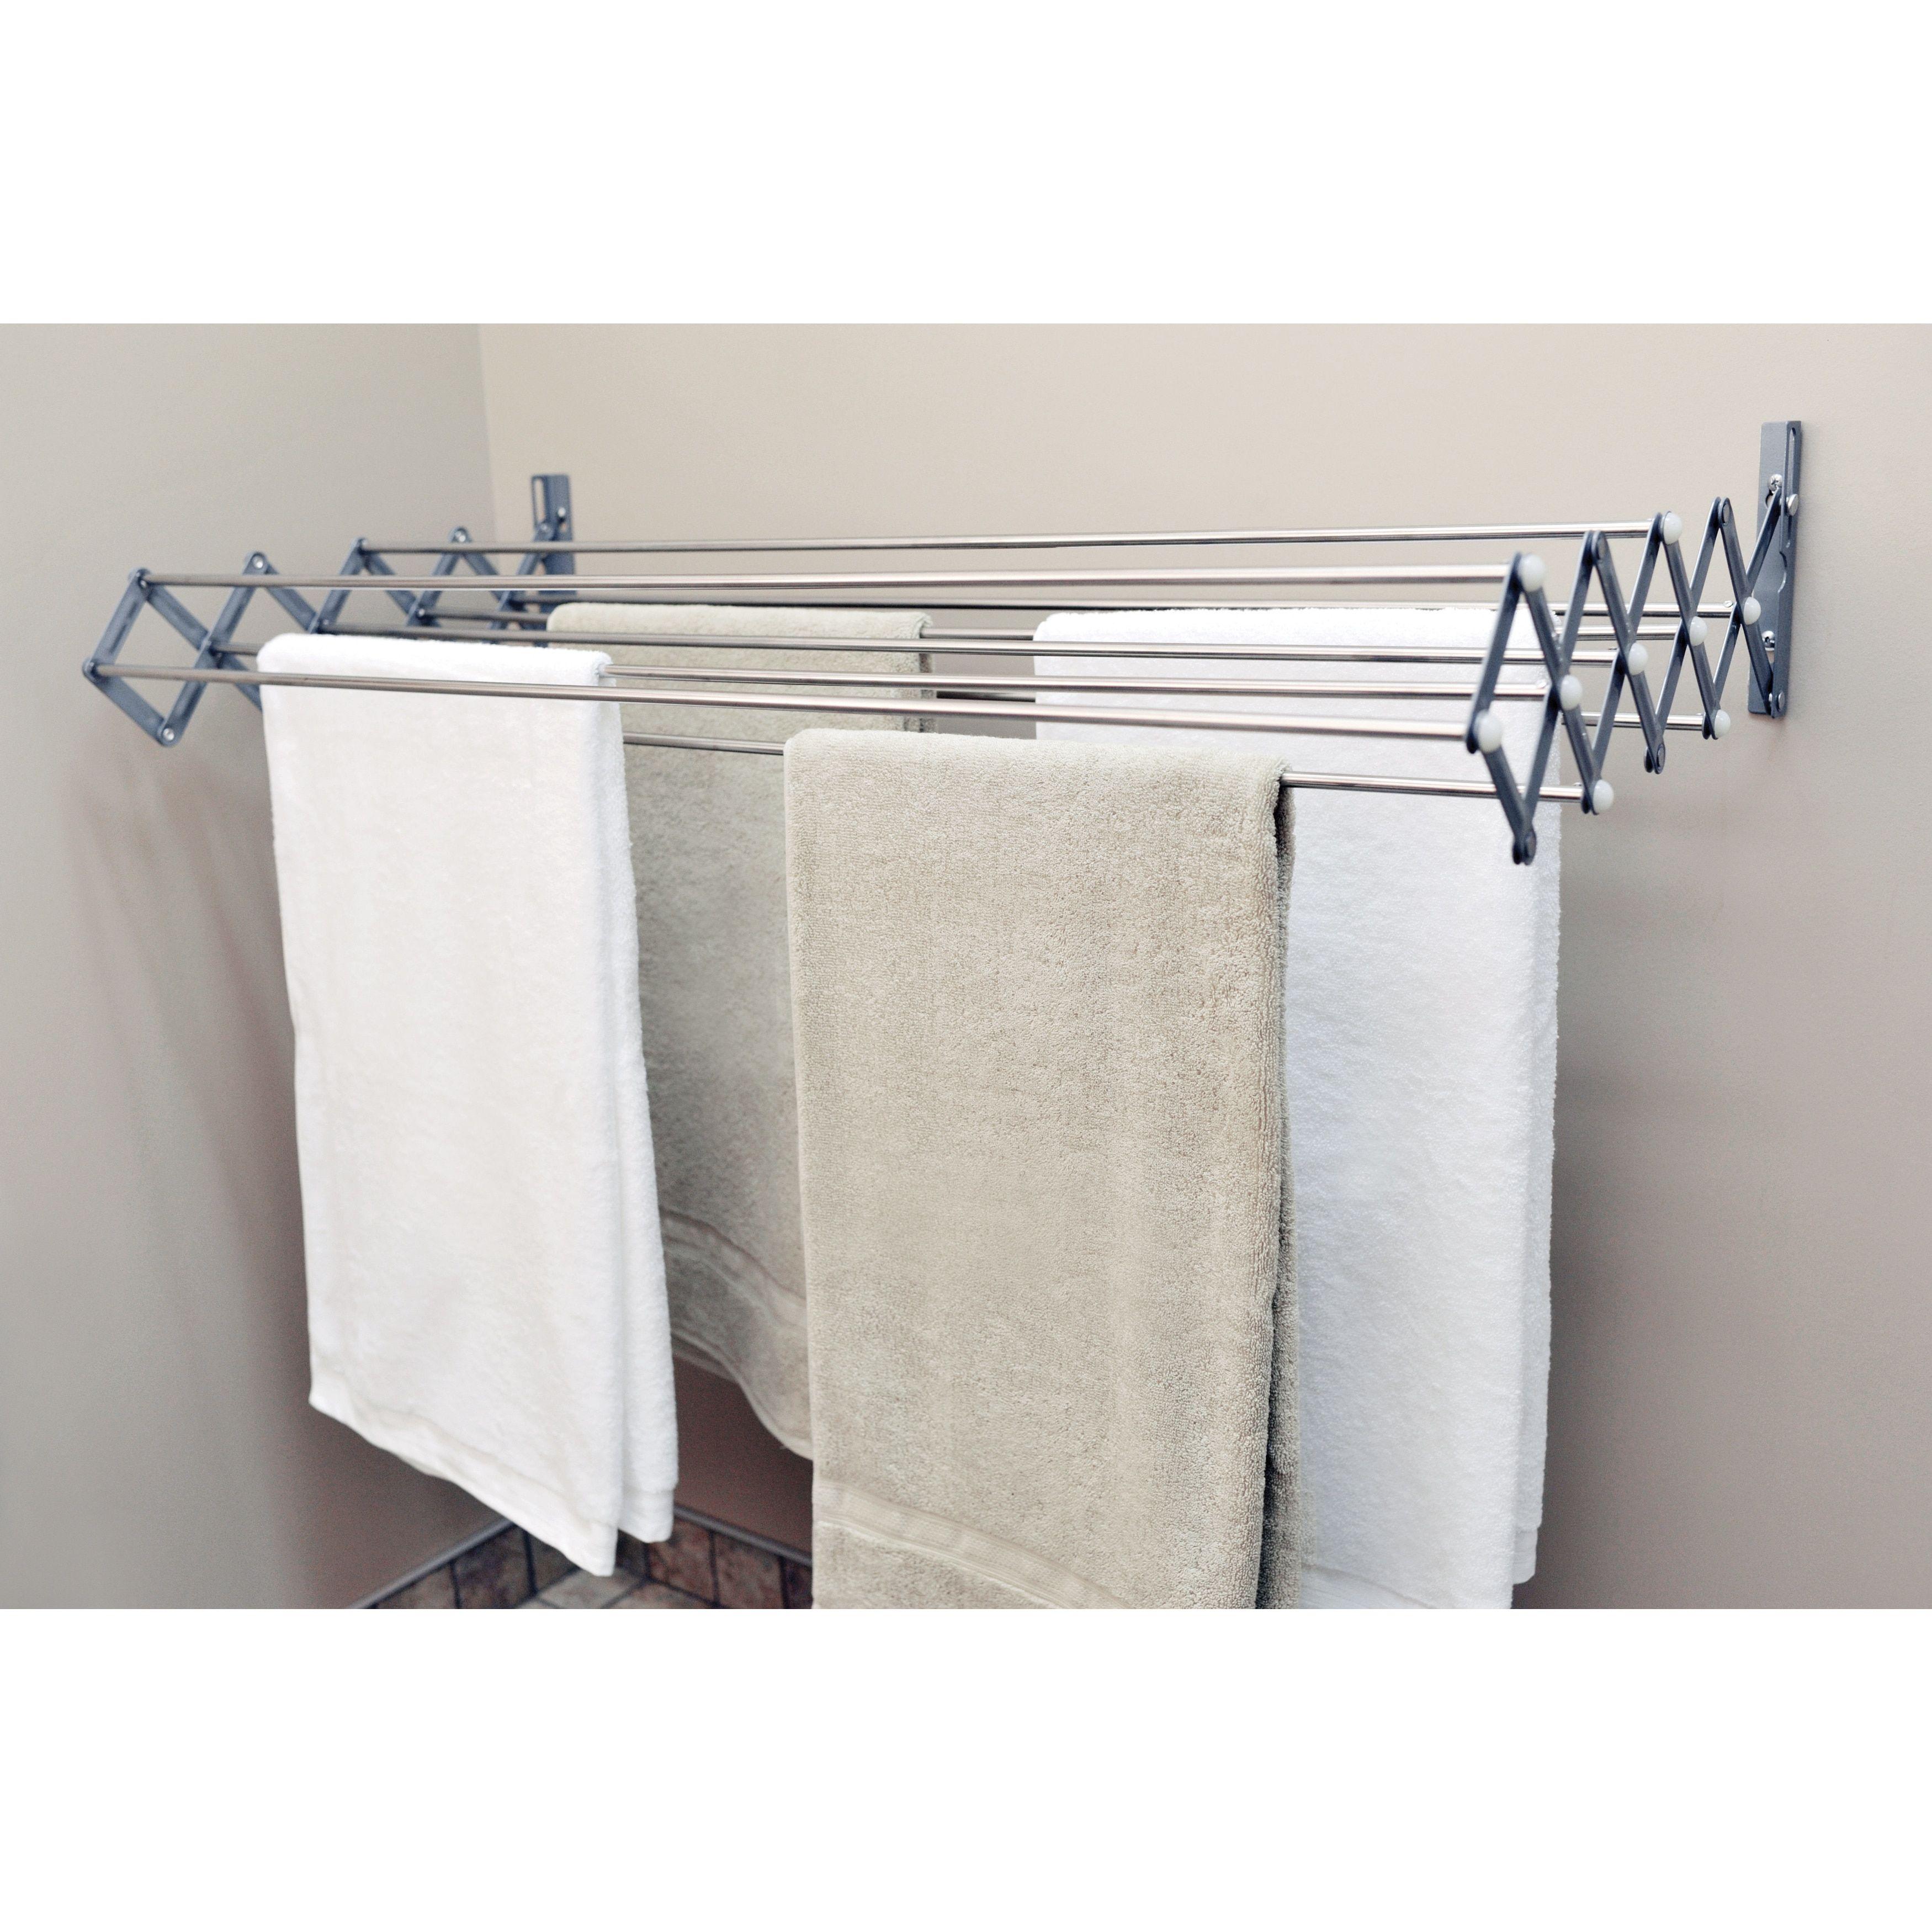 Accordion Drying Rack Laundry Room Organization Laundry Room